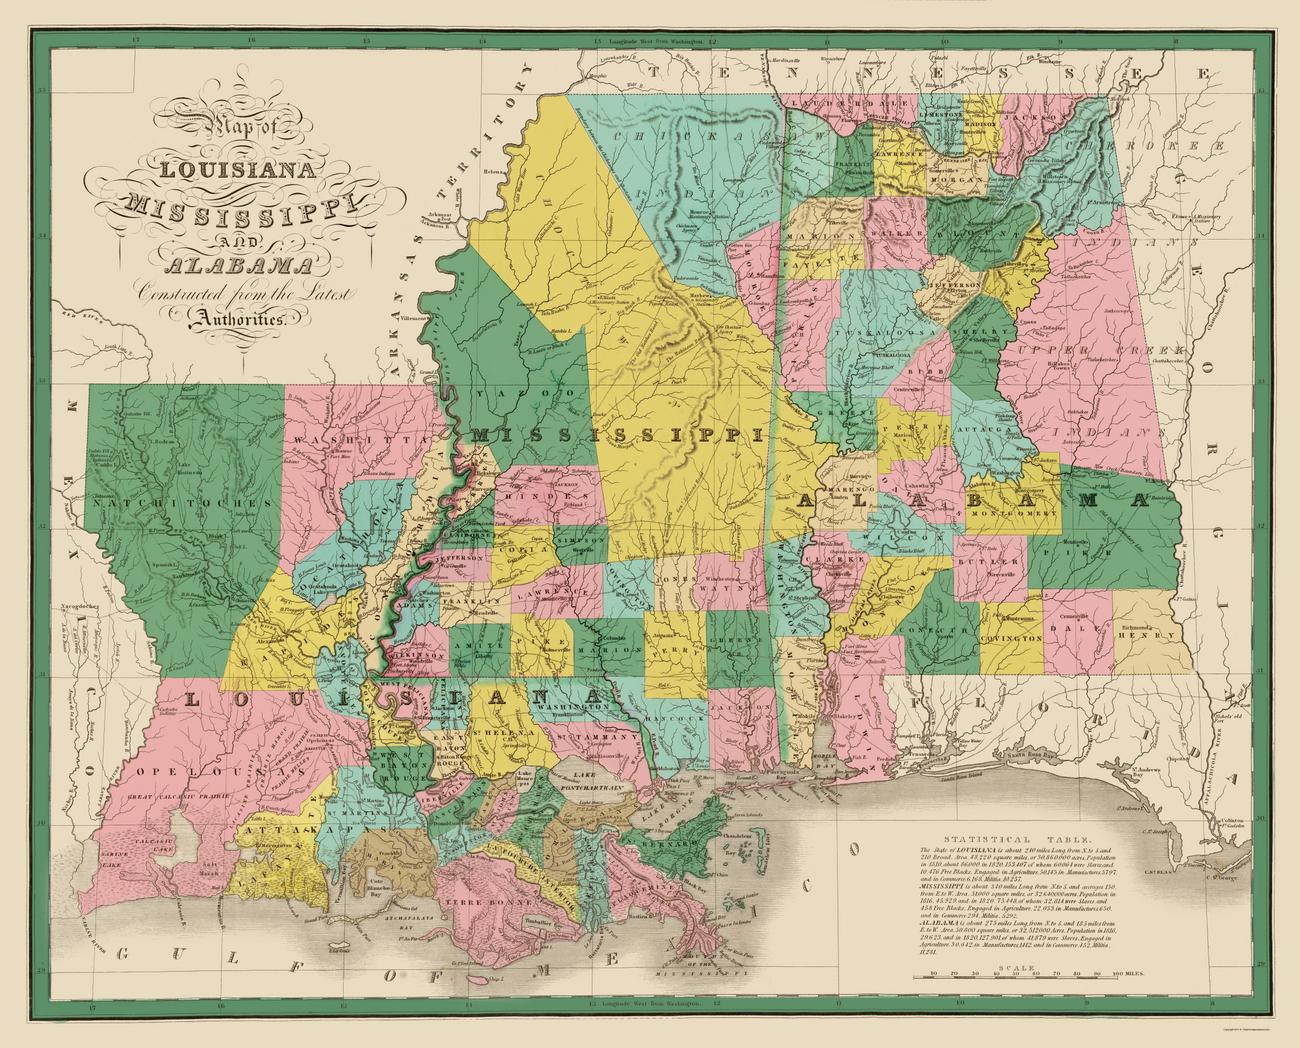 Old State Maps  LOUISIANA MISSISSIPPI Amp ALABAMA LAMSAL